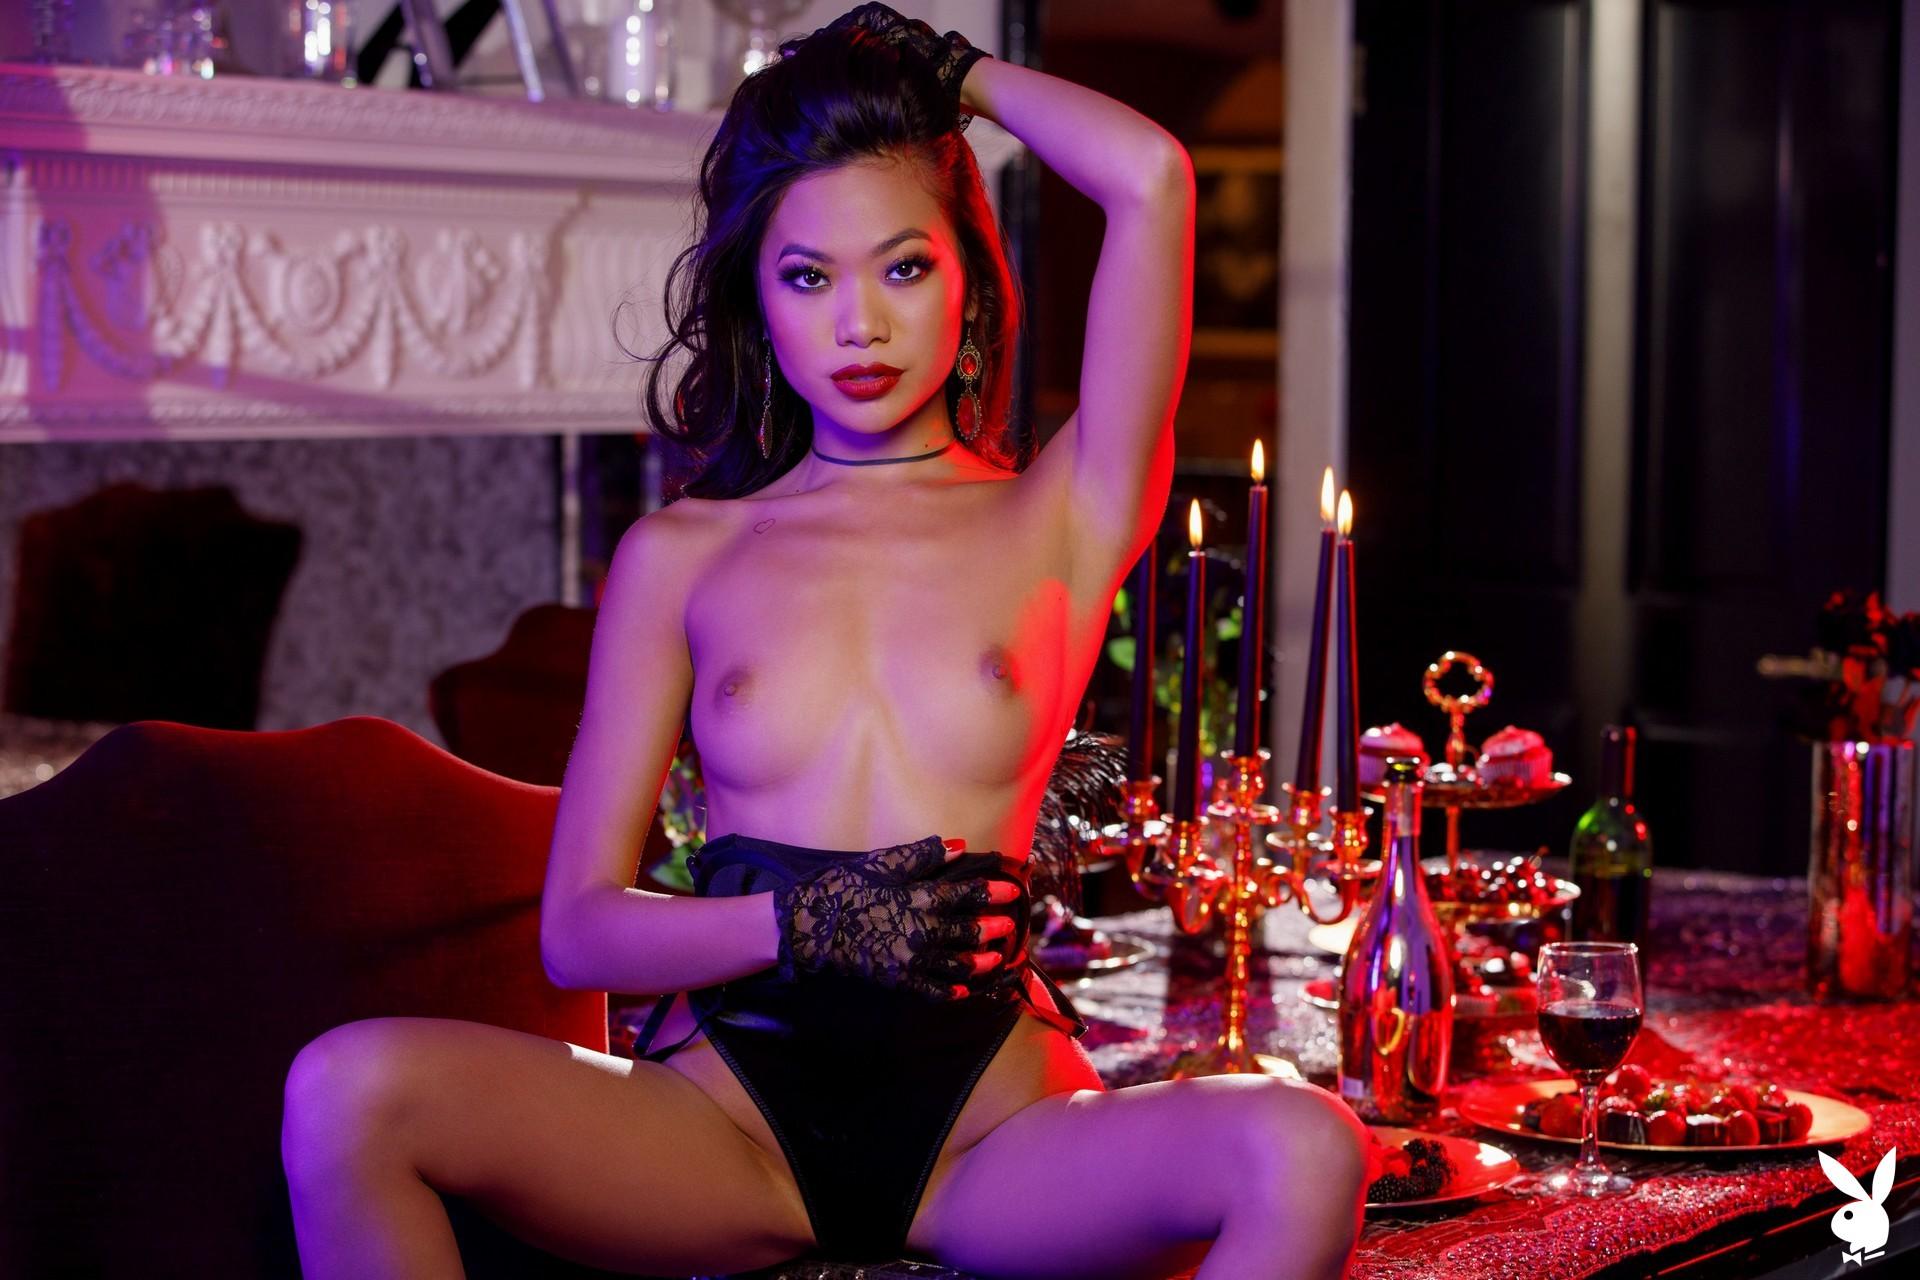 Vina Sky In Midnight Indulgence Playboy Plus (12)